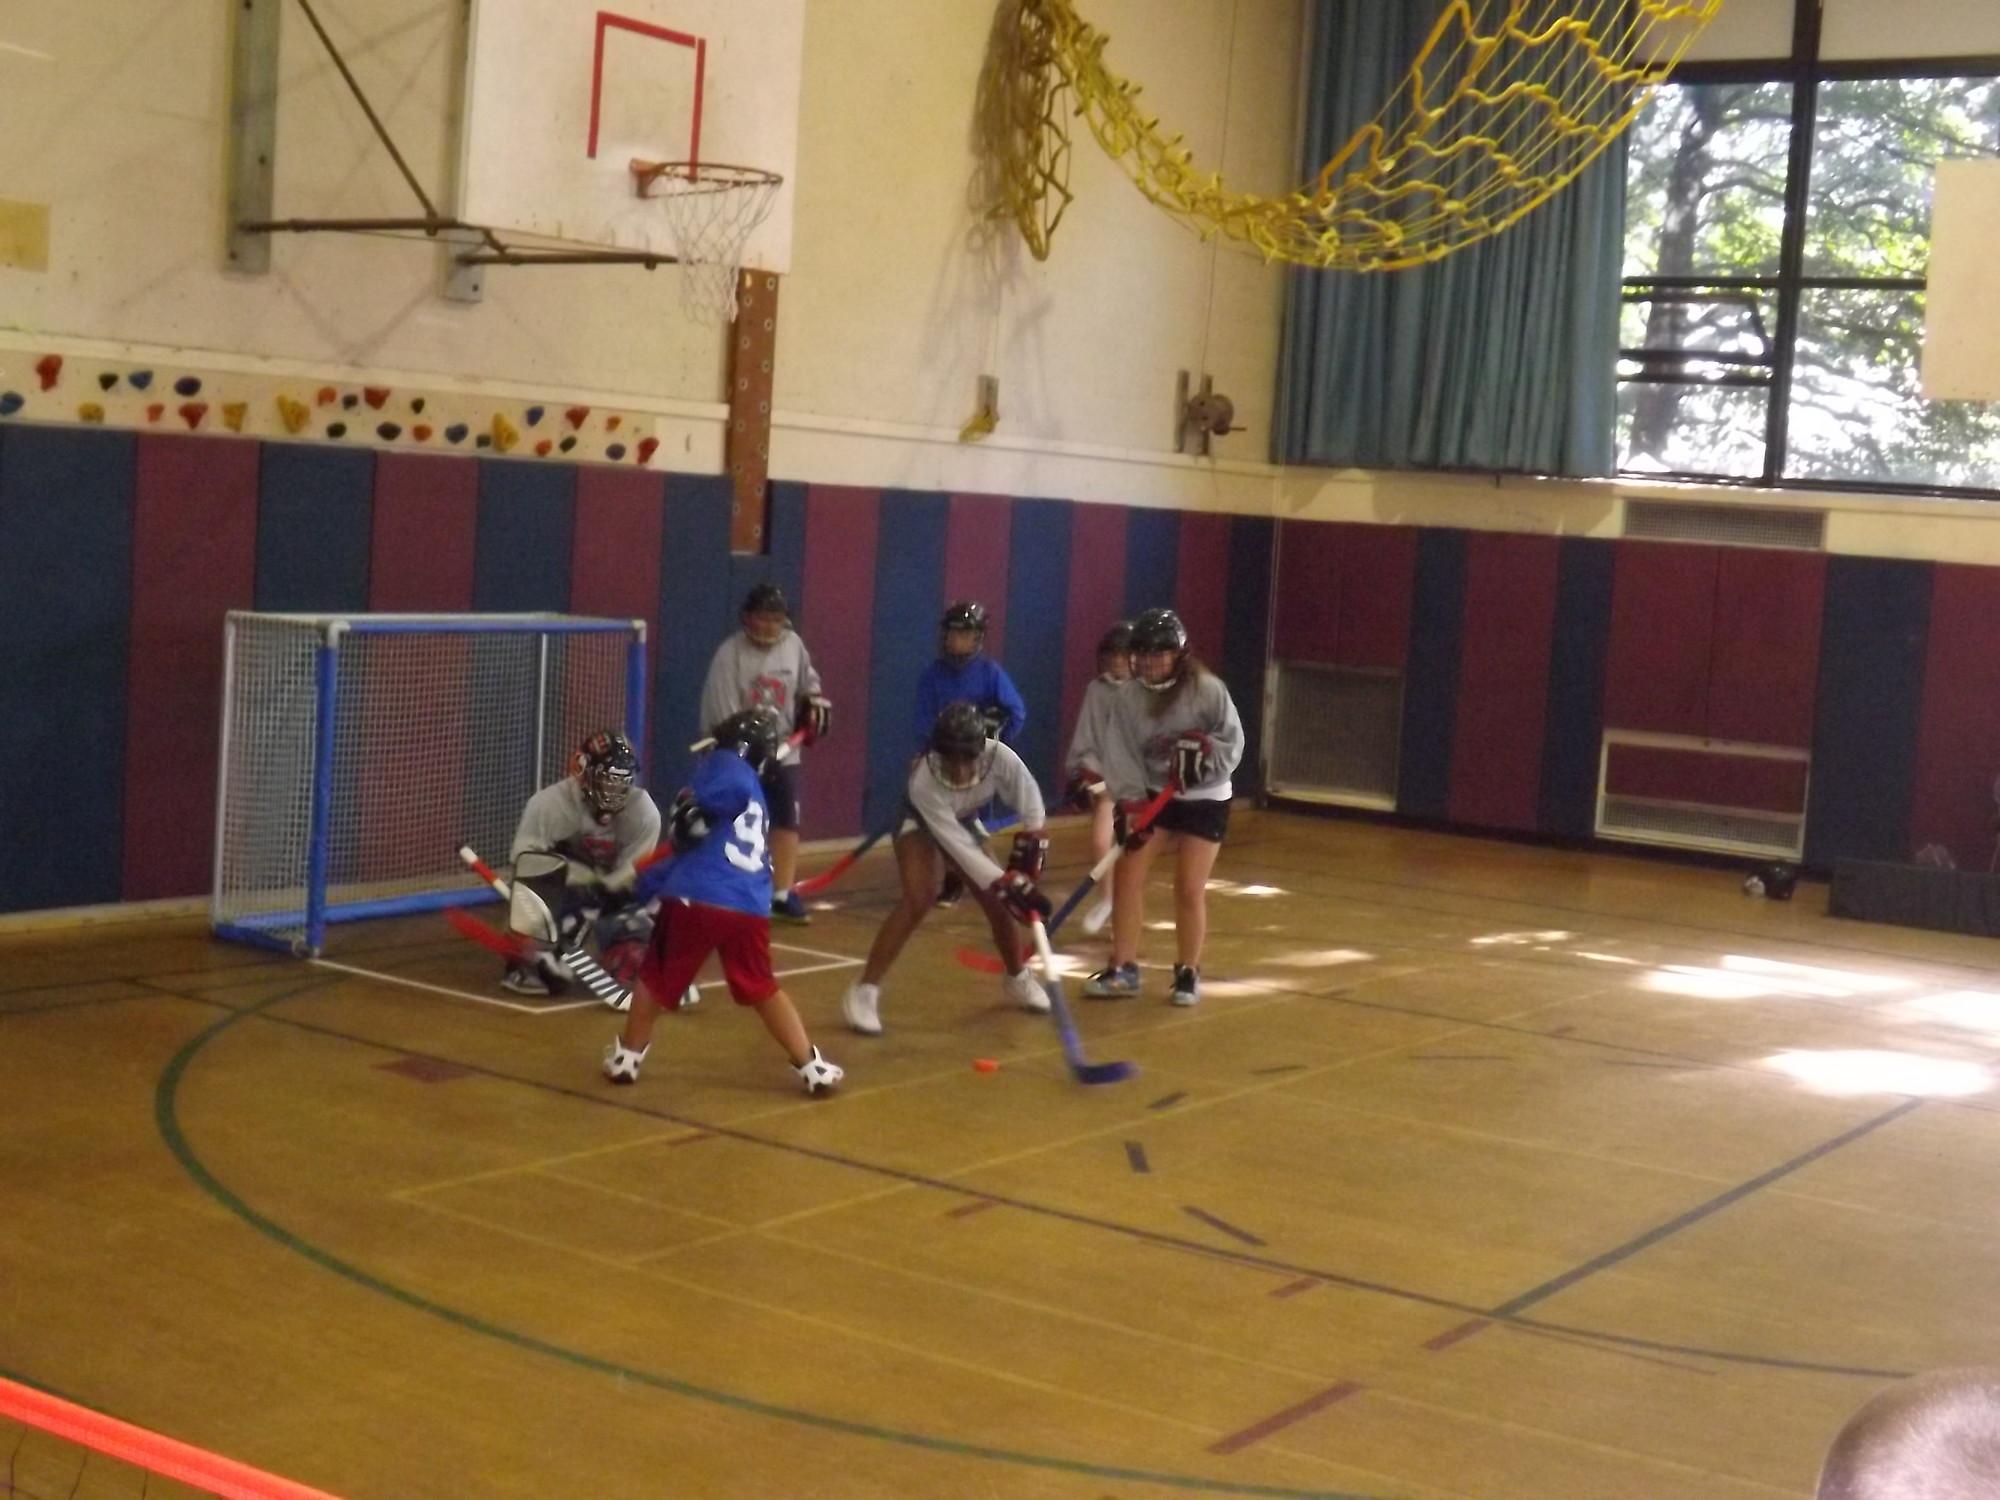 Summer Hockey League Nets Big Turnout